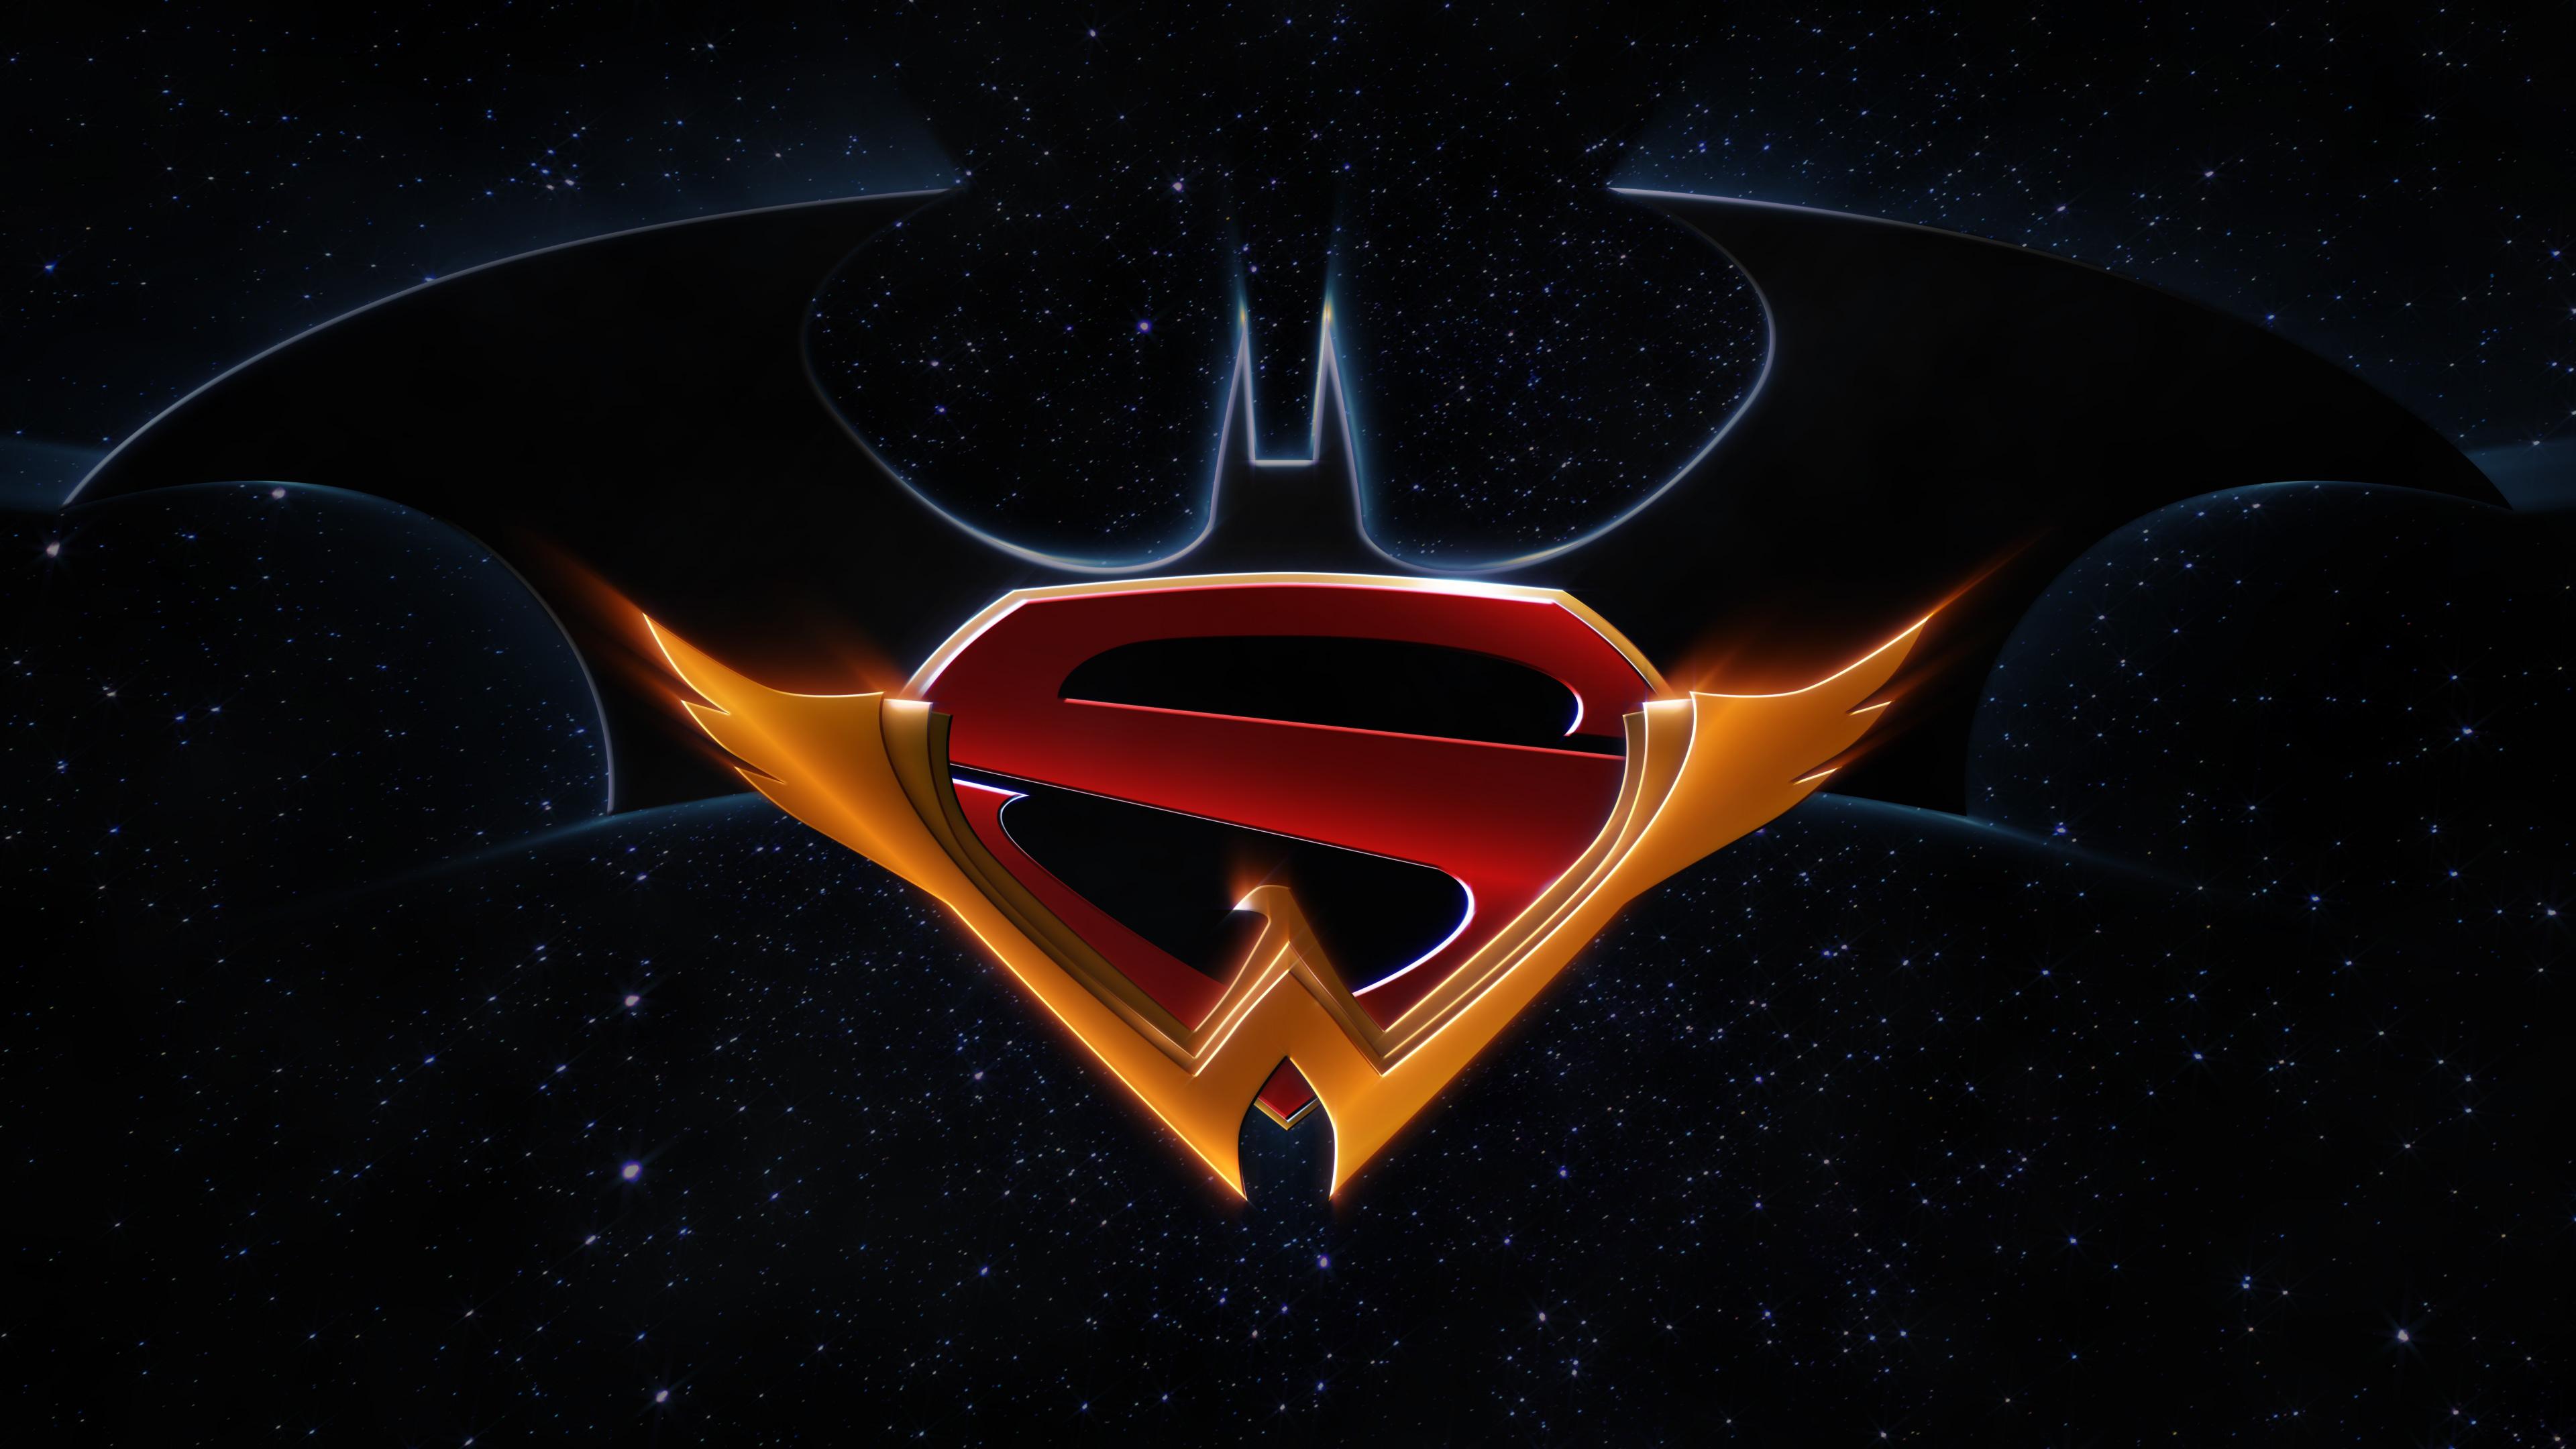 batman superman wonder woman trinity logo 1536523875 - Batman Superman Wonder Woman Trinity Logo - wonder woman wallpapers, superman wallpapers, superheroes wallpapers, logo wallpapers, hd-wallpapers, digital art wallpapers, batman wallpapers, artwork wallpapers, 4k-wallpapers